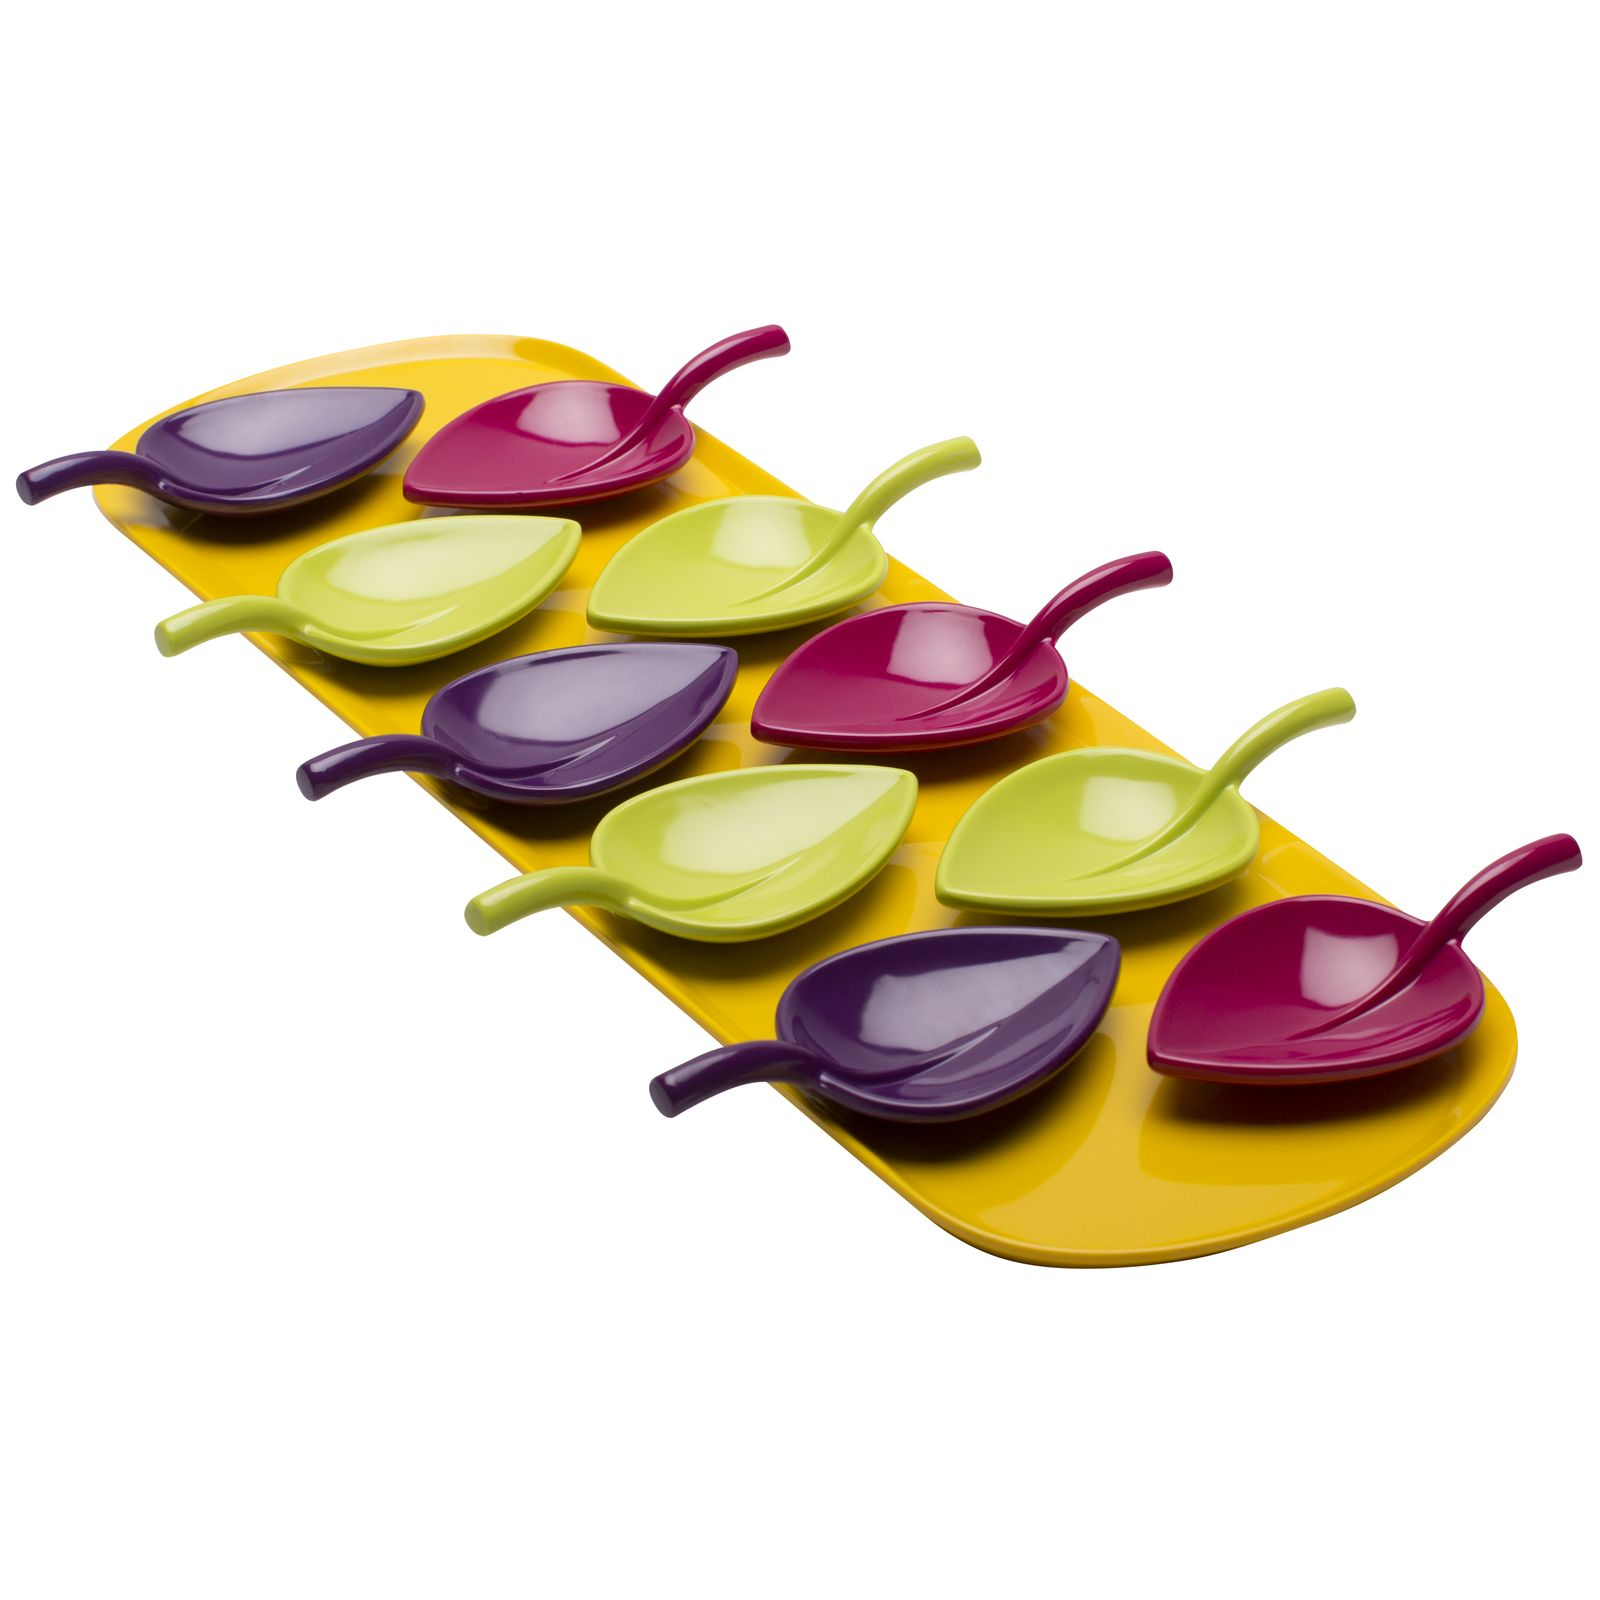 Zak Design zak designs fulla leaf-shaped tasting spoon set with tray - flora